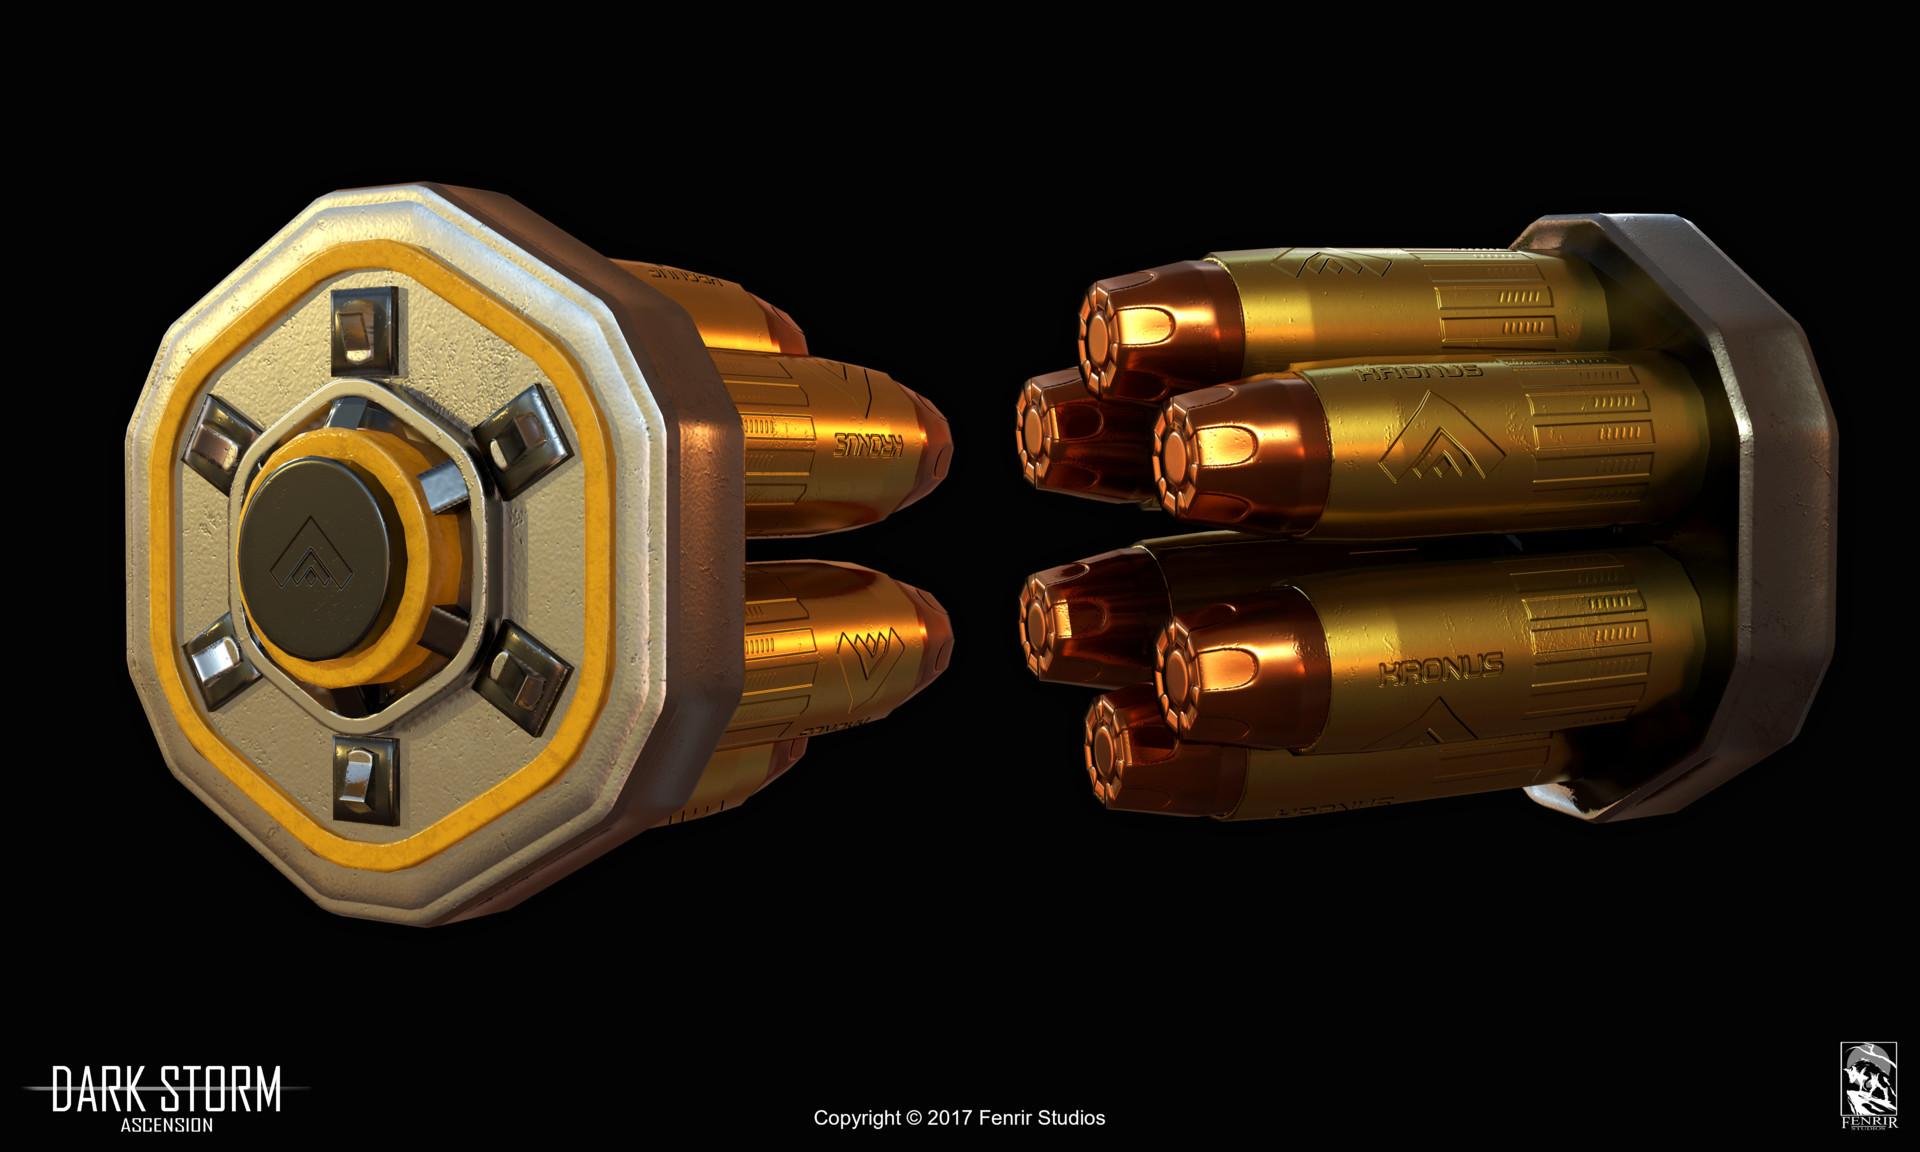 Nikolaos kaltsogiannis presentation revolver 01